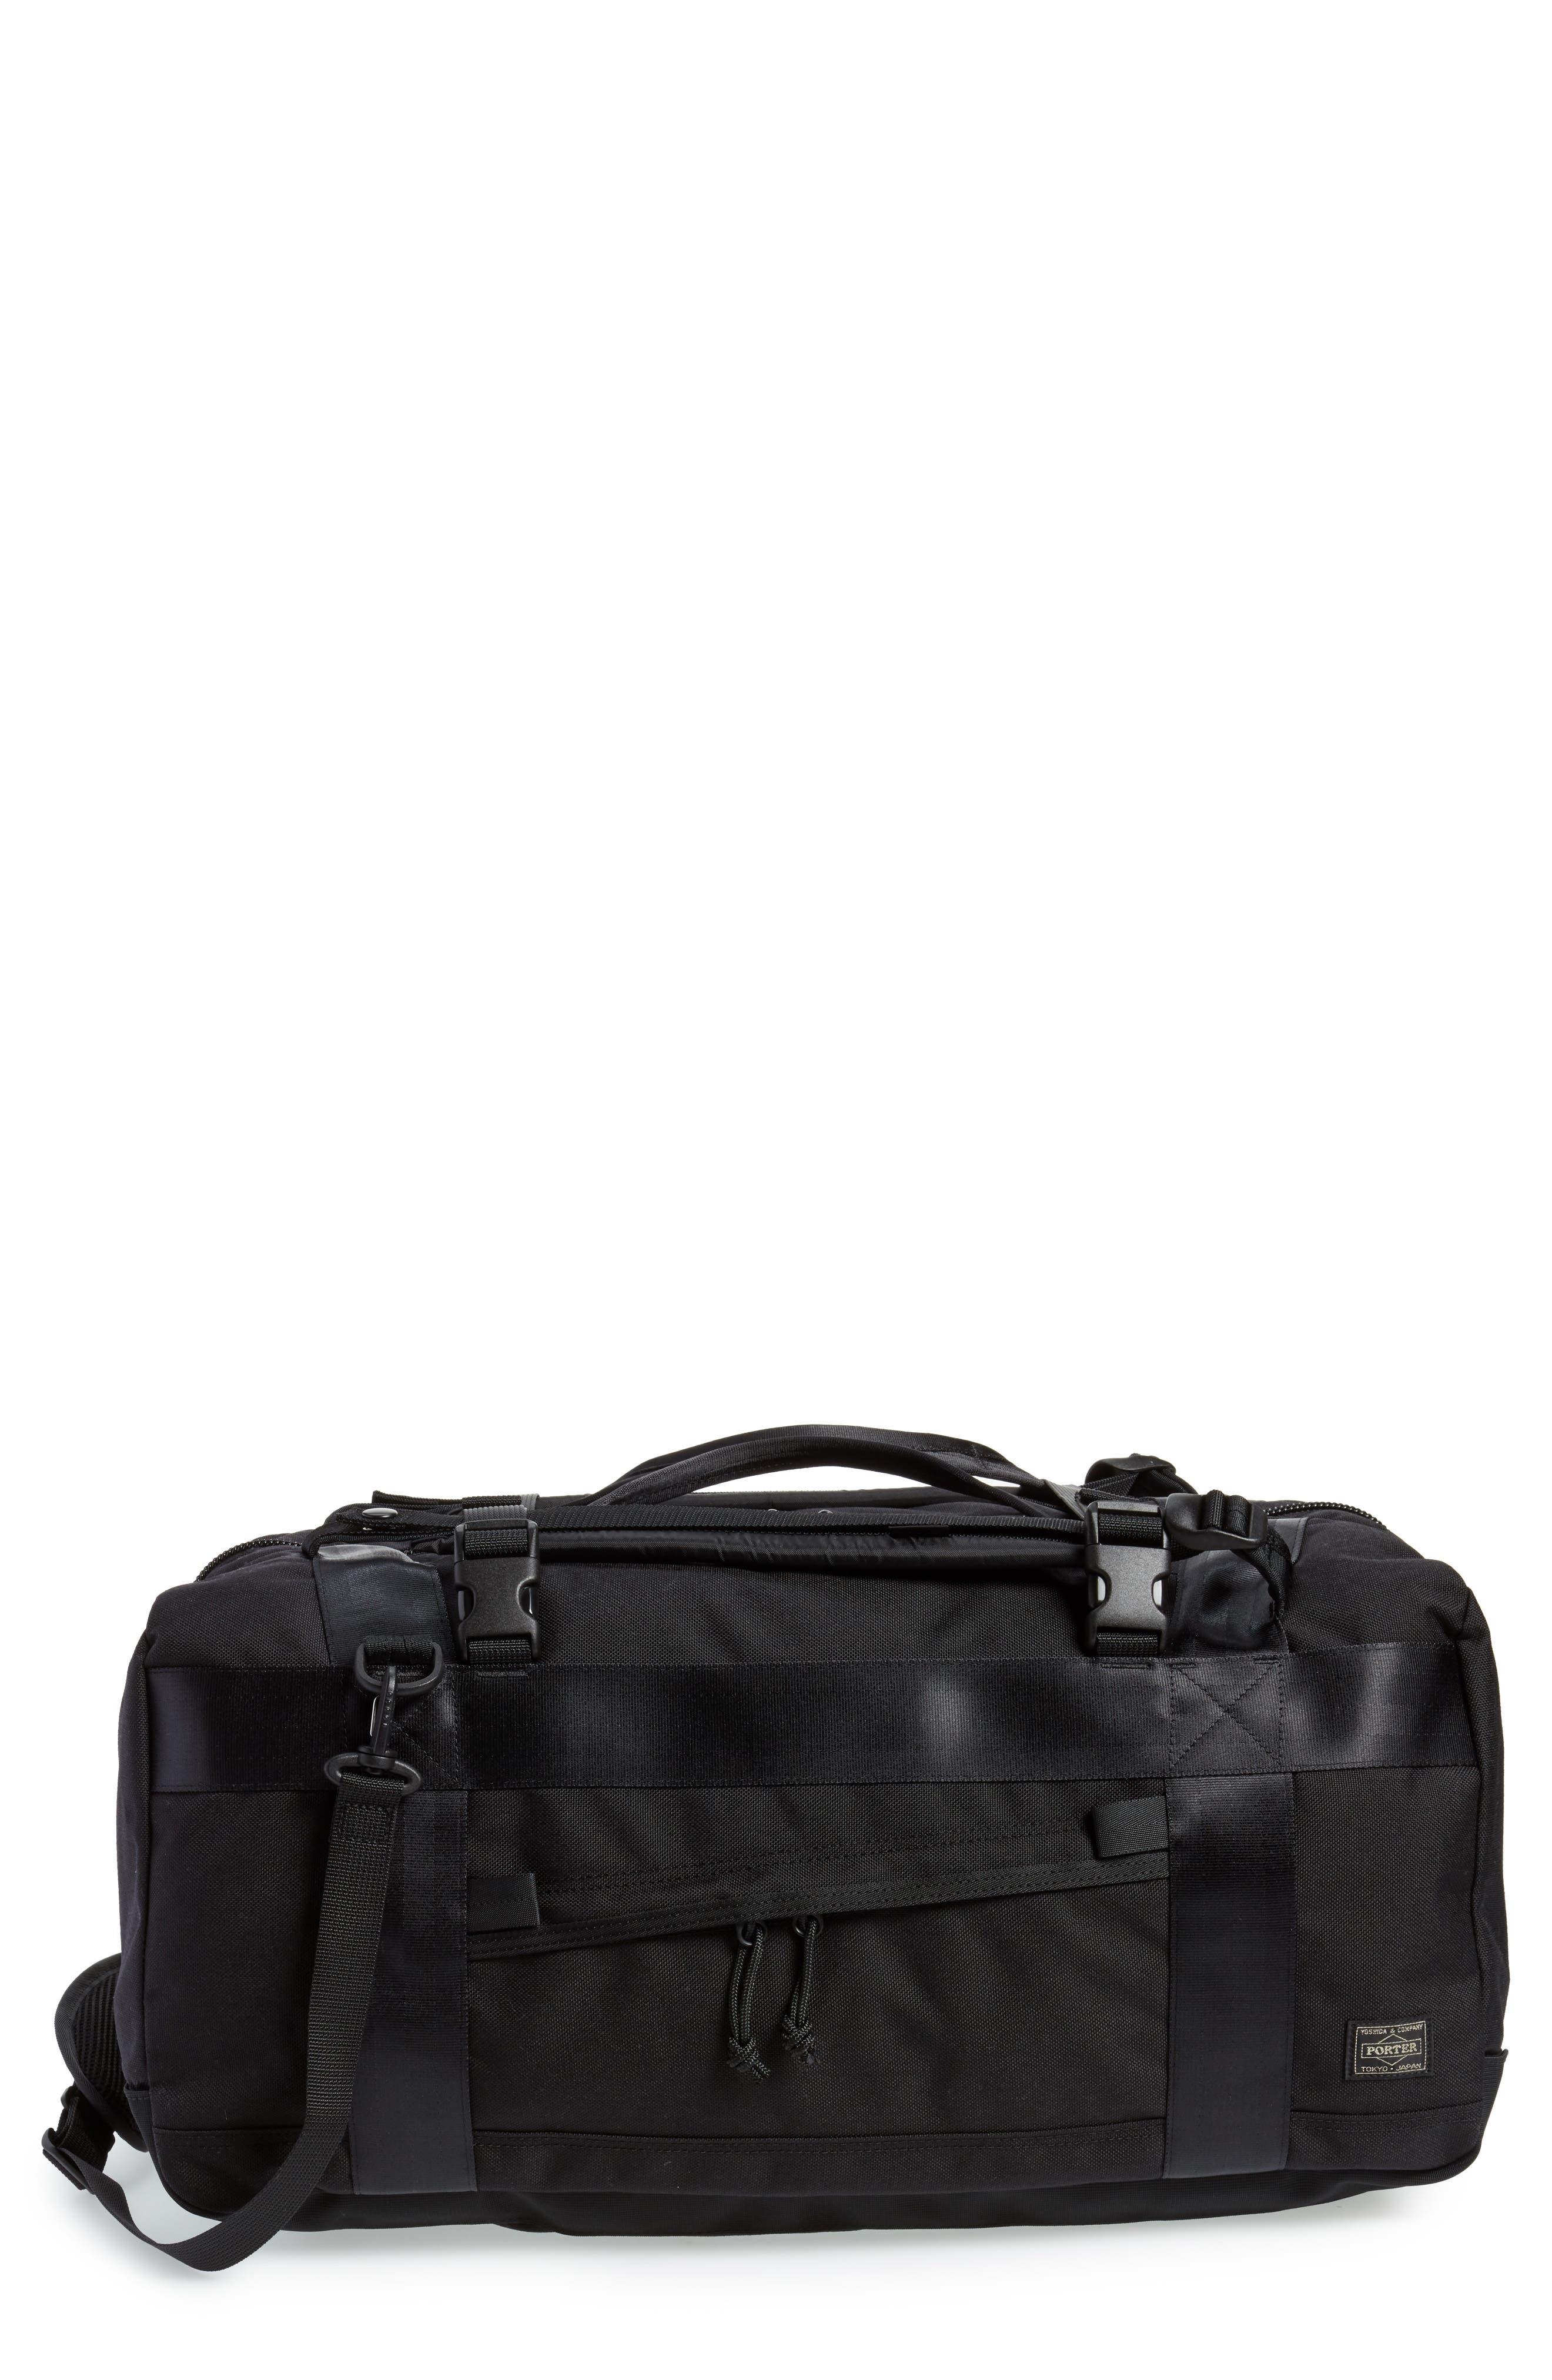 Porter-Yoshida & Co. Boothpack Convertible Duffel Bag